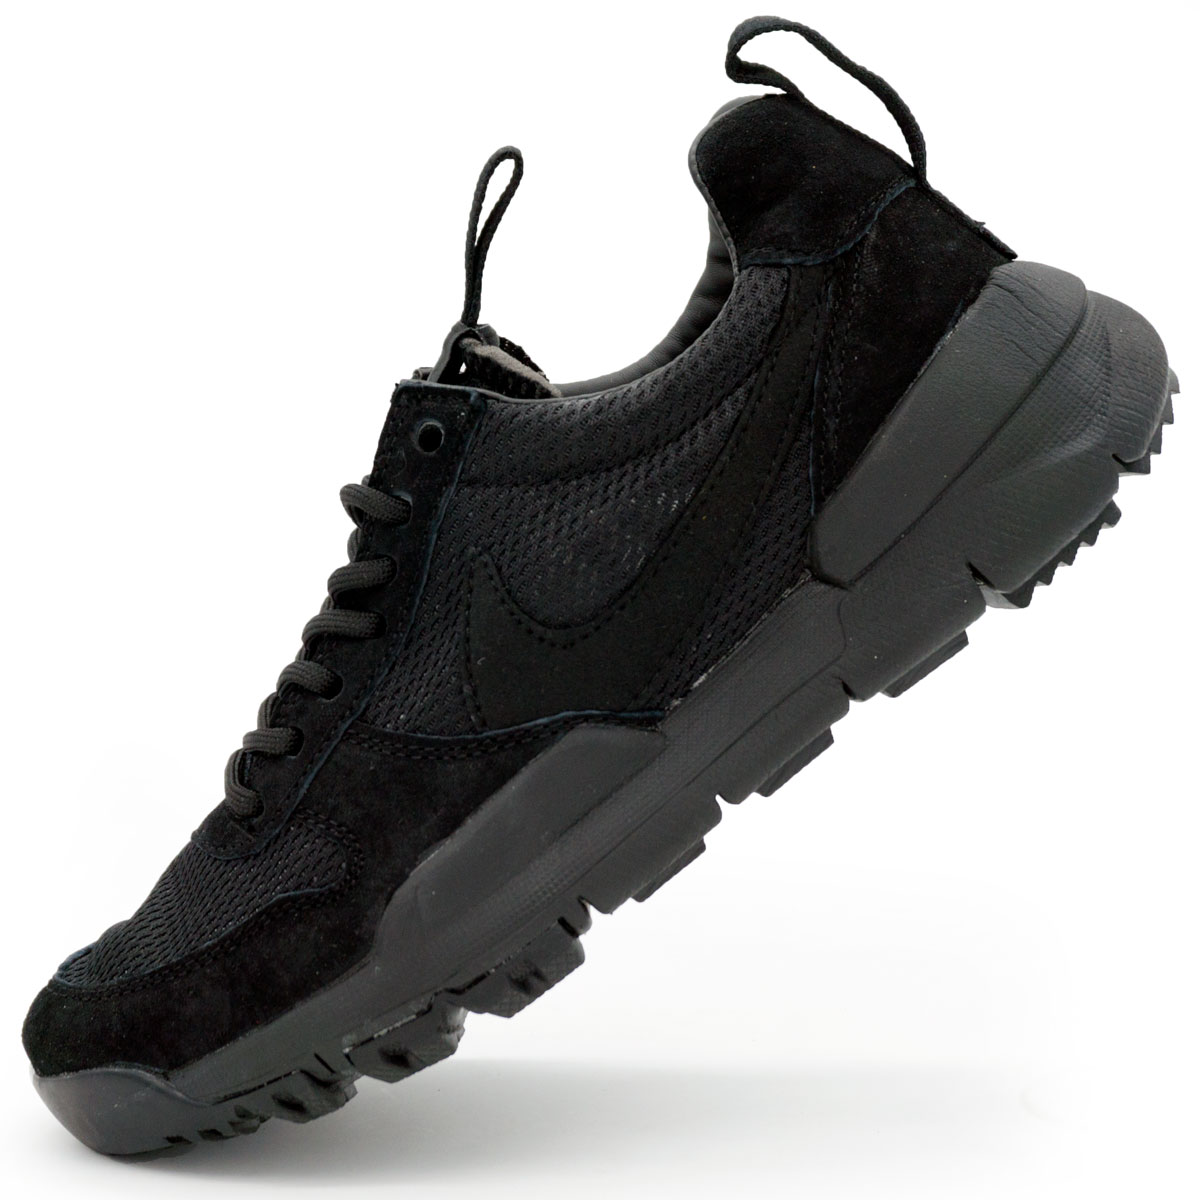 eb0b544c Топ качество! фото main Мужские кроссовки Nike Mars Yard 2.0 черные.